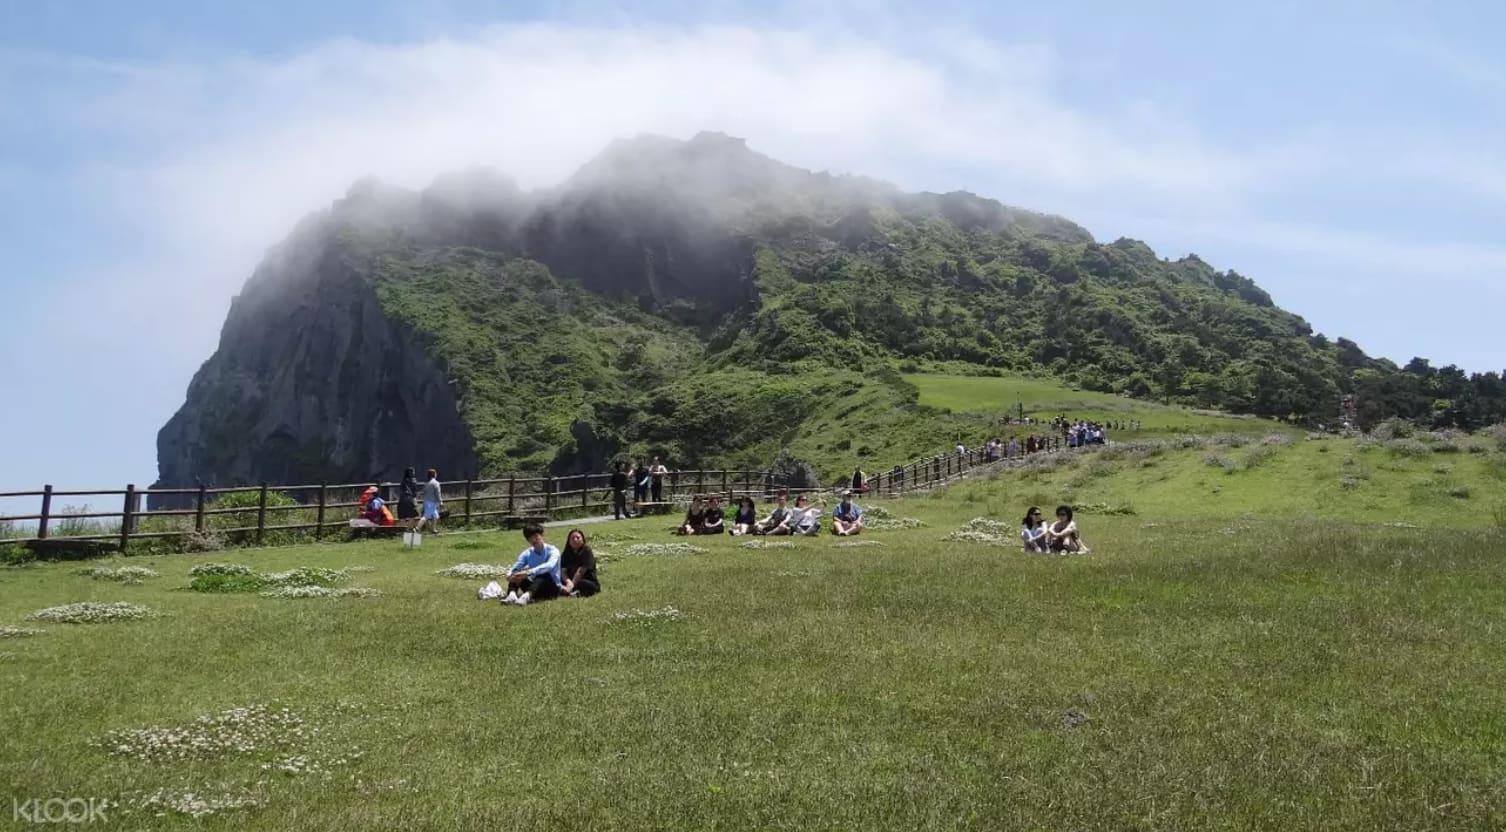 địa điểm tham quan ở đảo jeju: seongsan sunrise peak